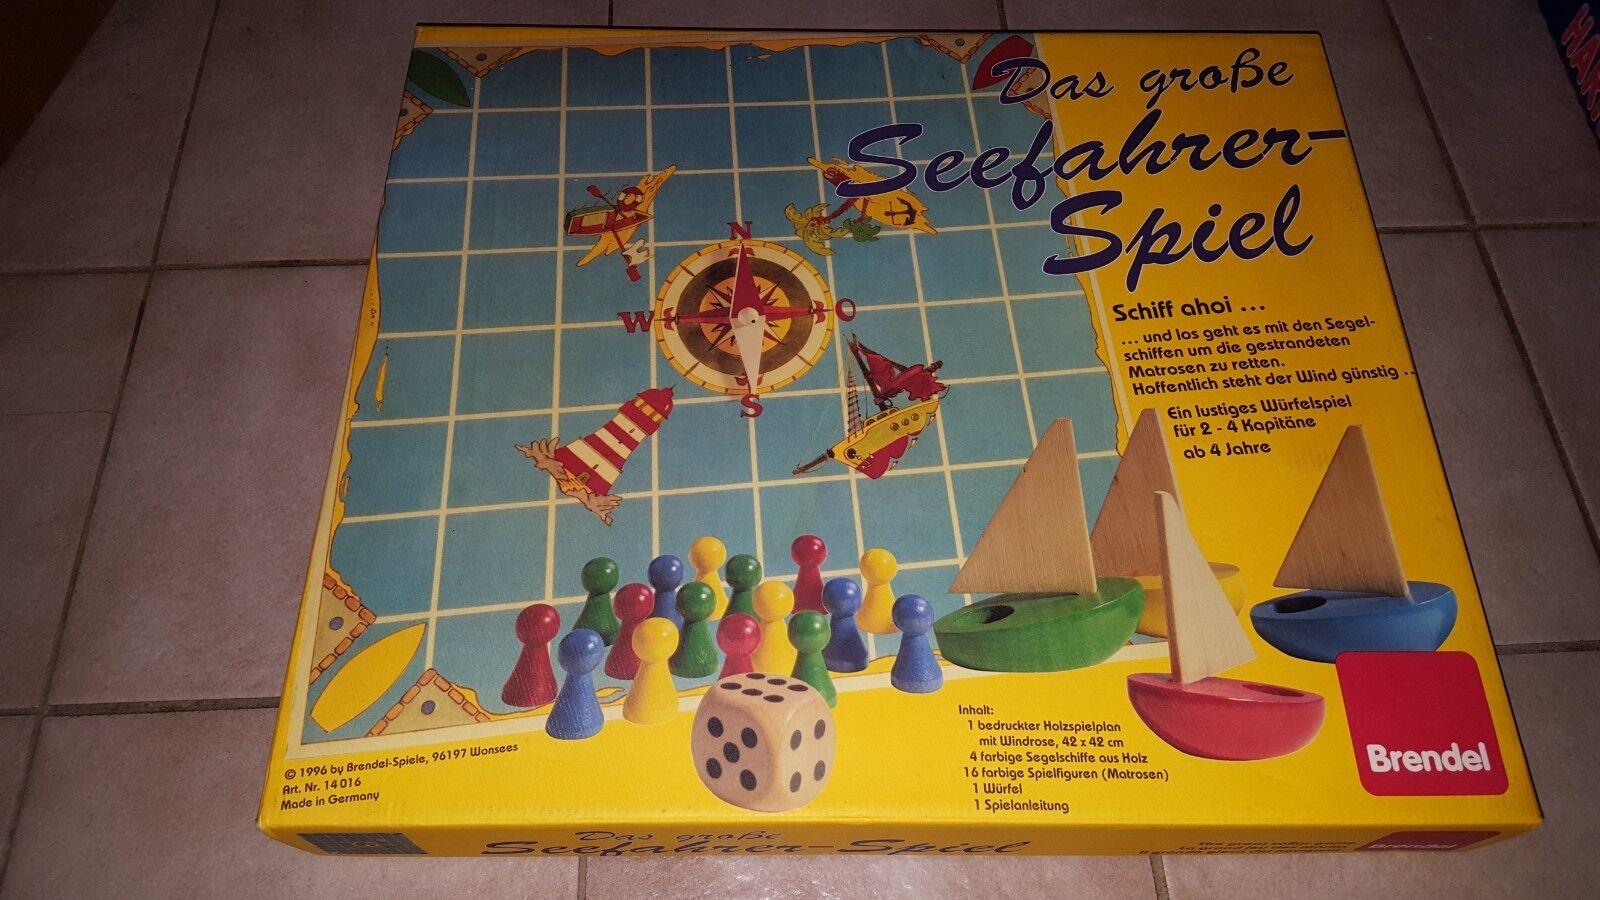 Brettspiel Brettspiel Brettspiel RARITÄT - BRENDEL 1996 - Das große Seefahrer Spiel - Holz - 4+ Jahre 12a1c2